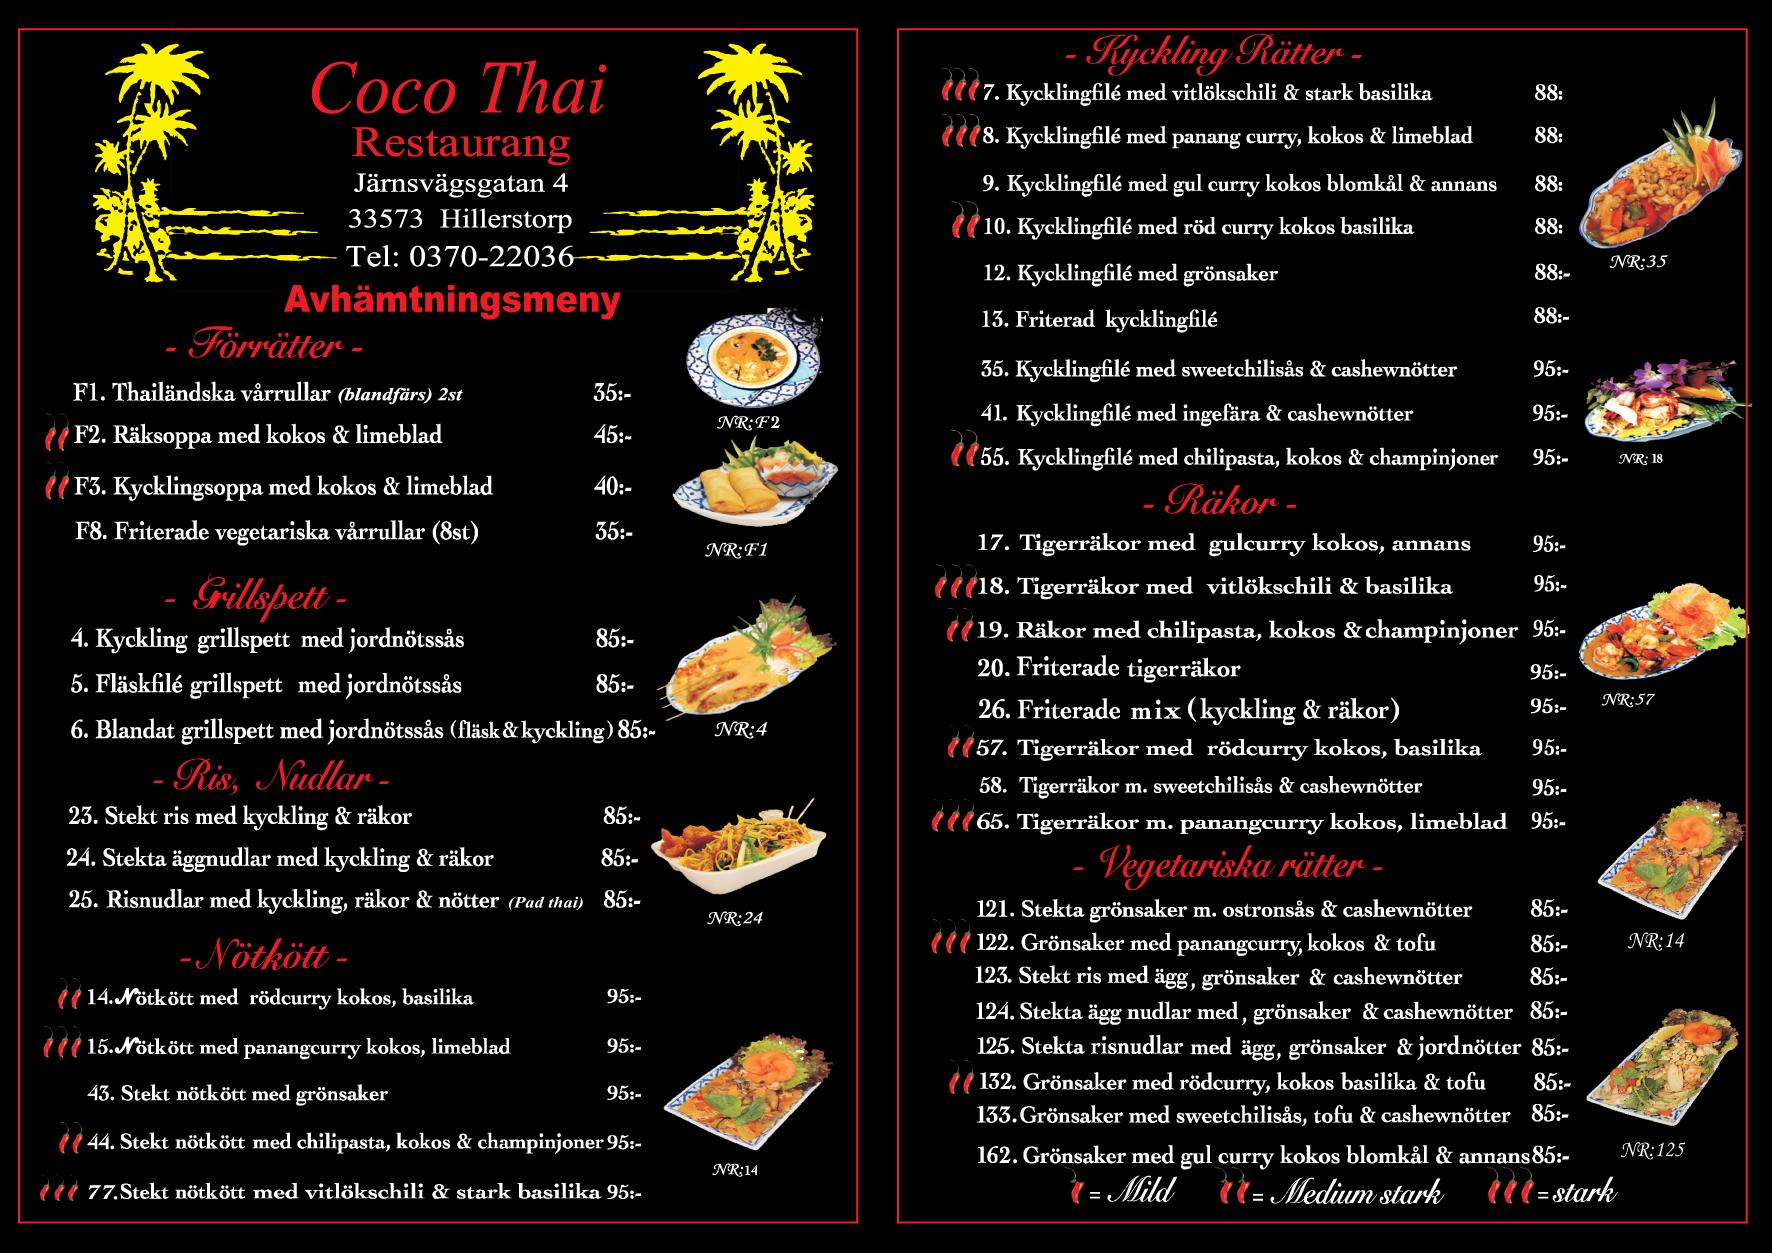 coco thai nässjö